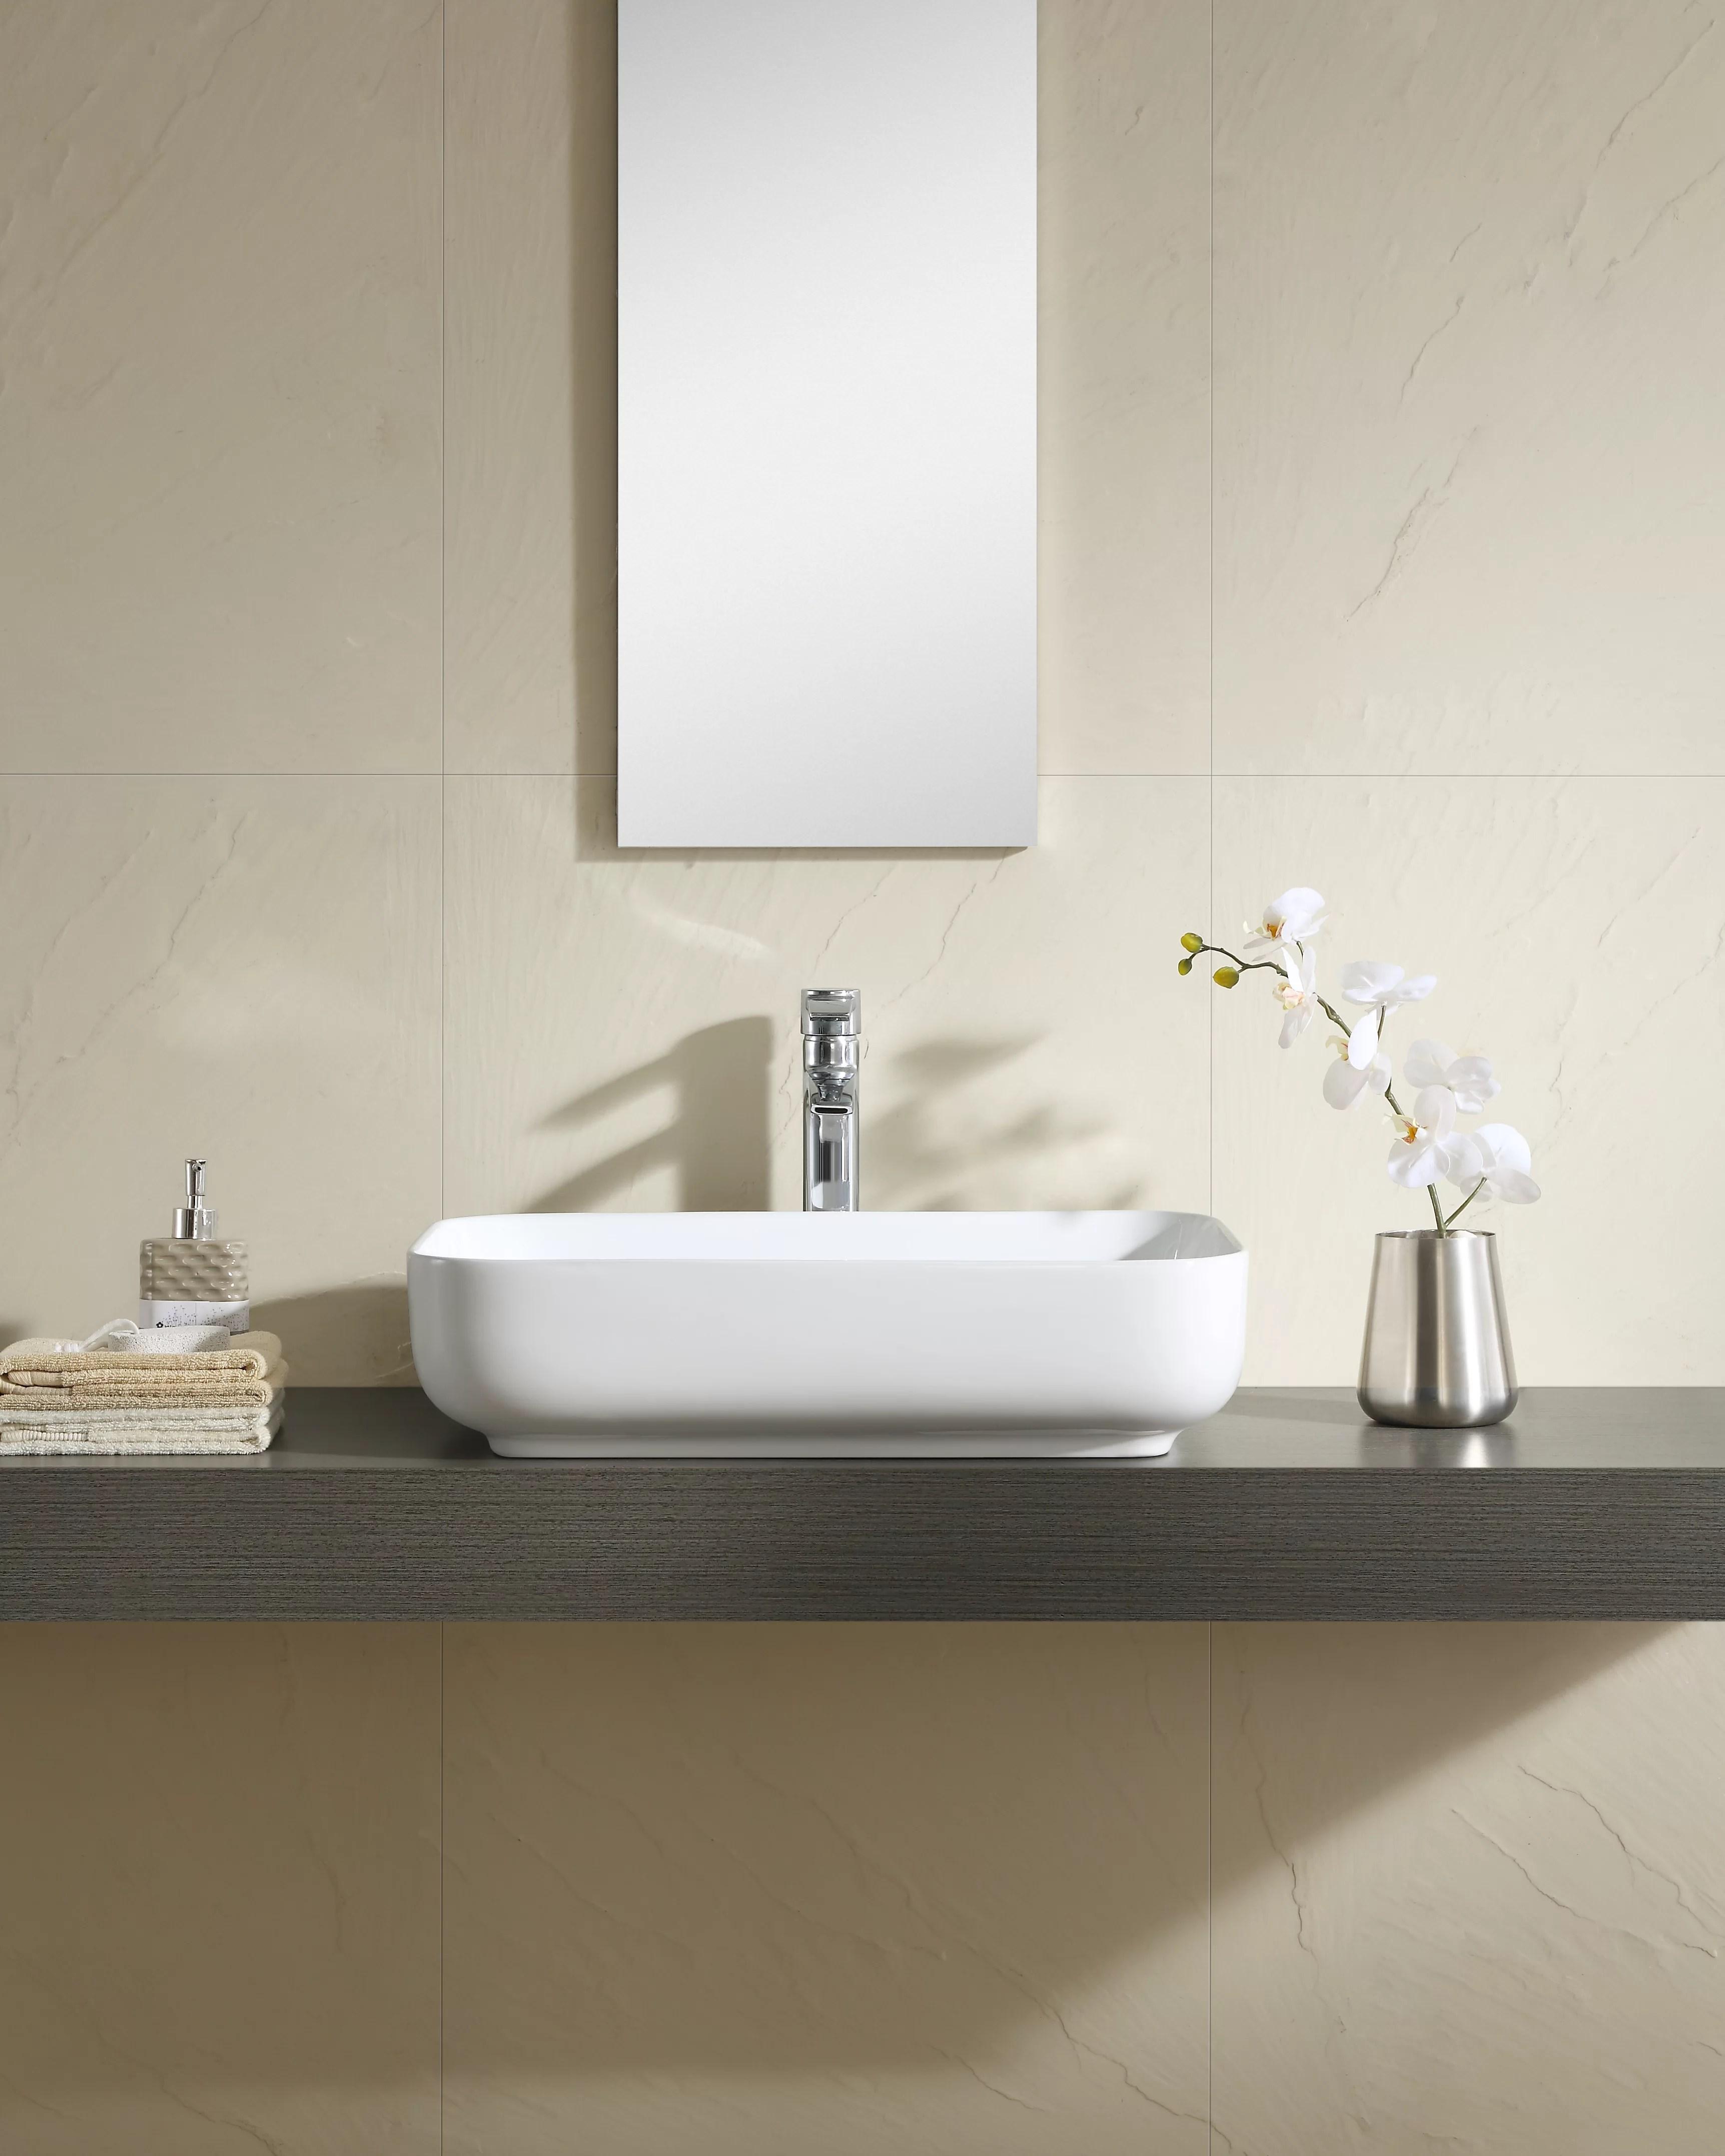 vitreous china rectangular wall mounted faucet bathroom sink